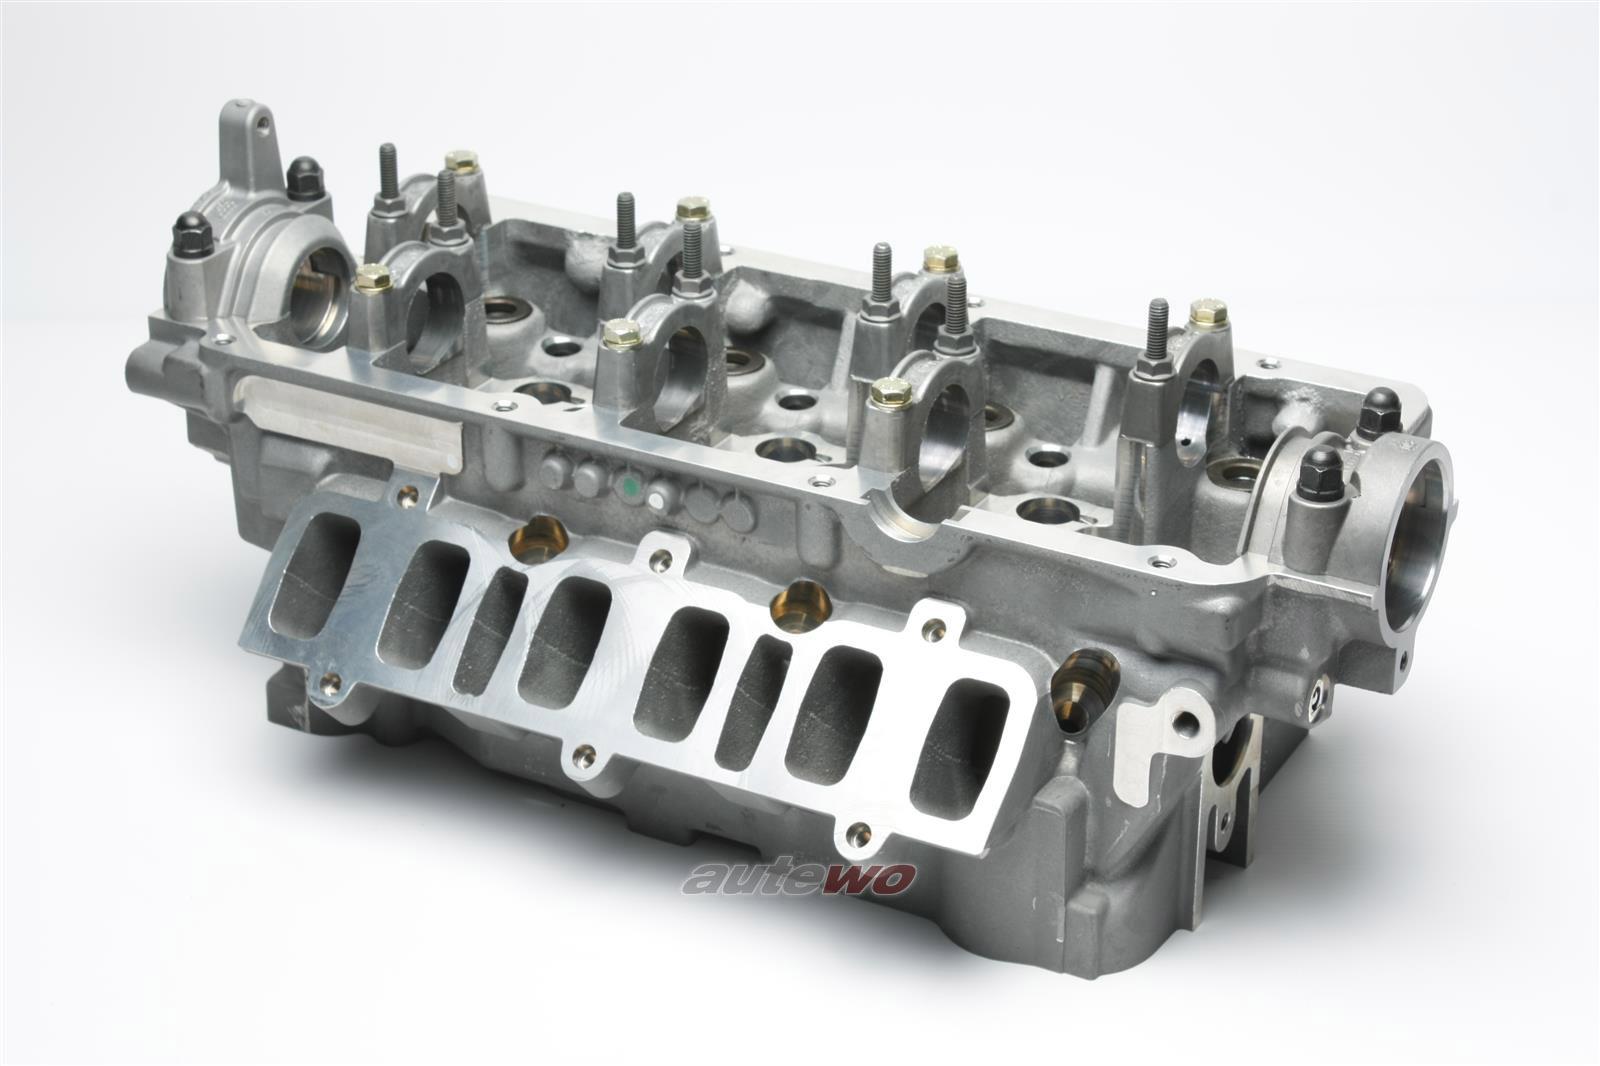 059103068X 059103354G NEU Audi A4 B5/8E/8H/A6 4B 2.5l TDI Zylinderkopf Rechts